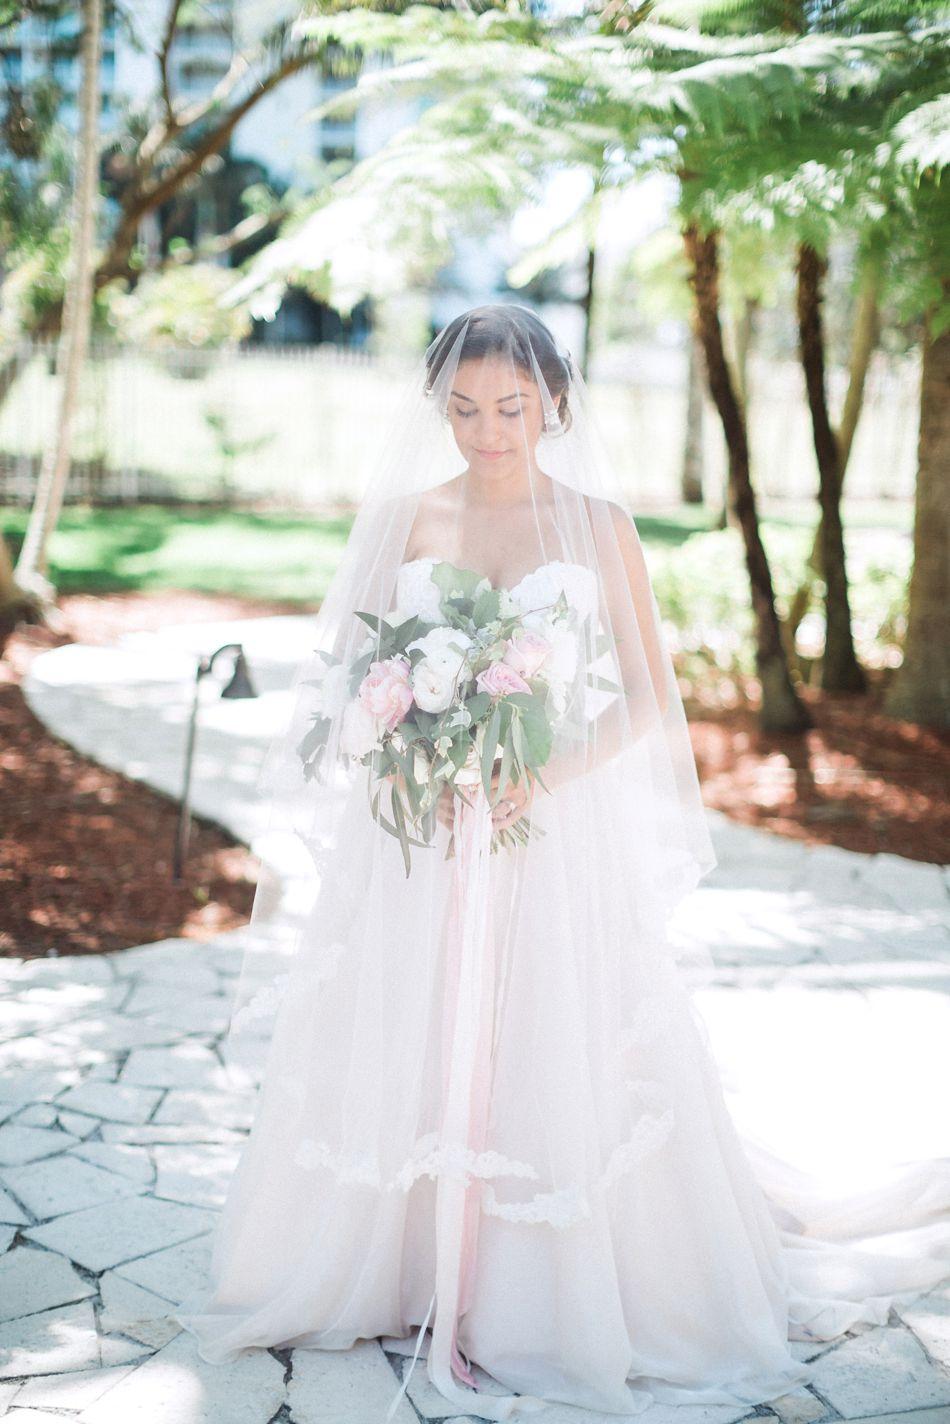 Cocktail-Reception-Wedding-Garden-Inspired-Hunter-Ryan-Photo-Elleson-Events_0522.jpg